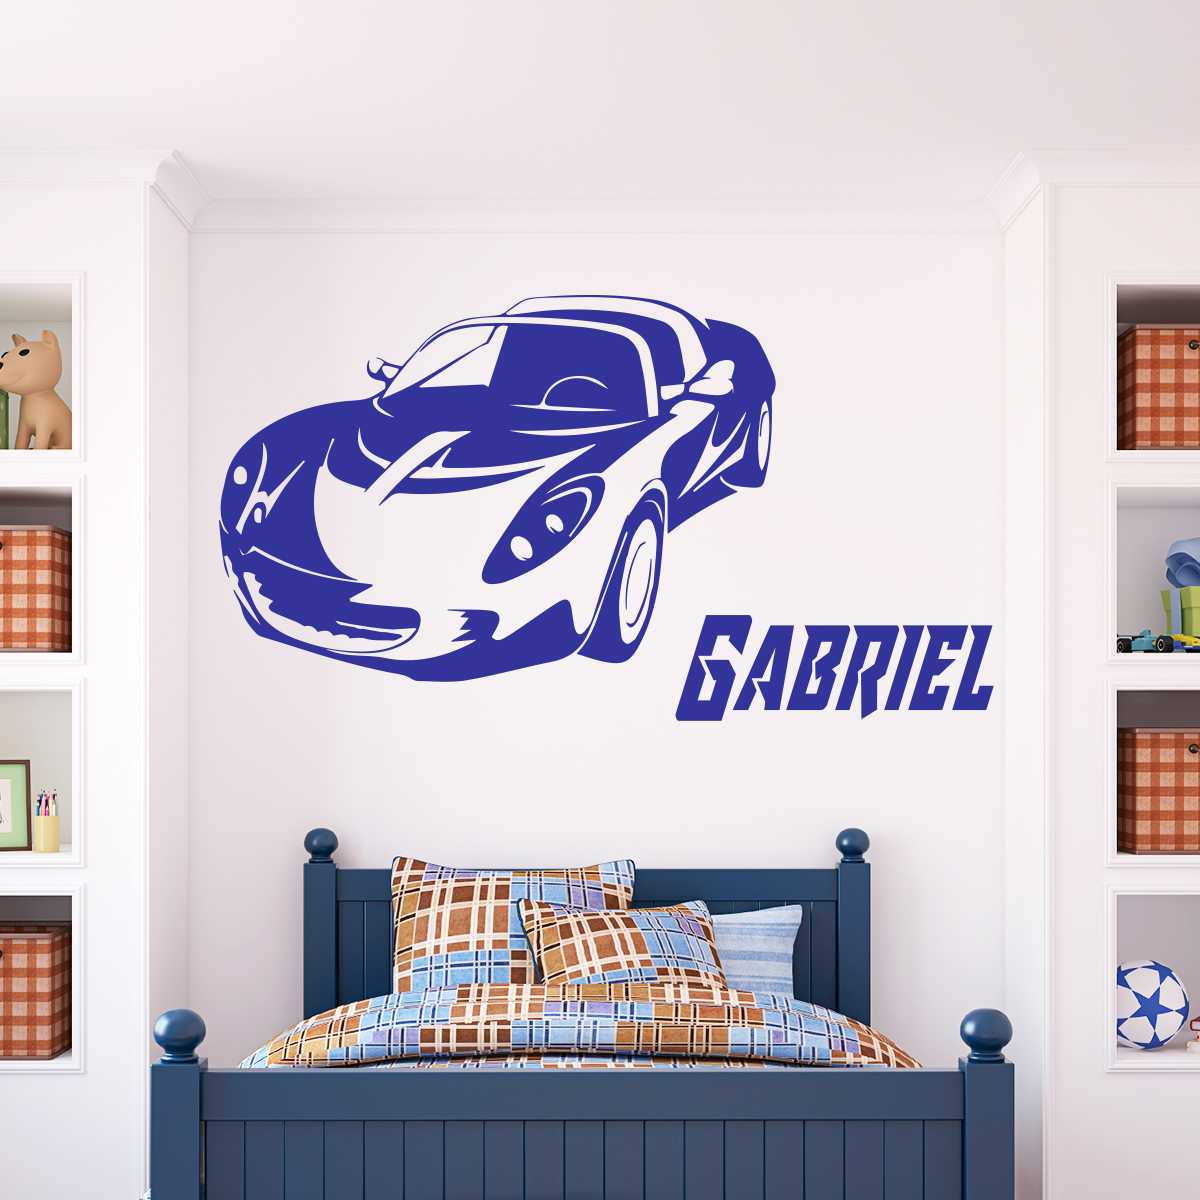 Sticker pr nom personnalisable voiture a rodynamique for Stickers muraux chambre ado garcon